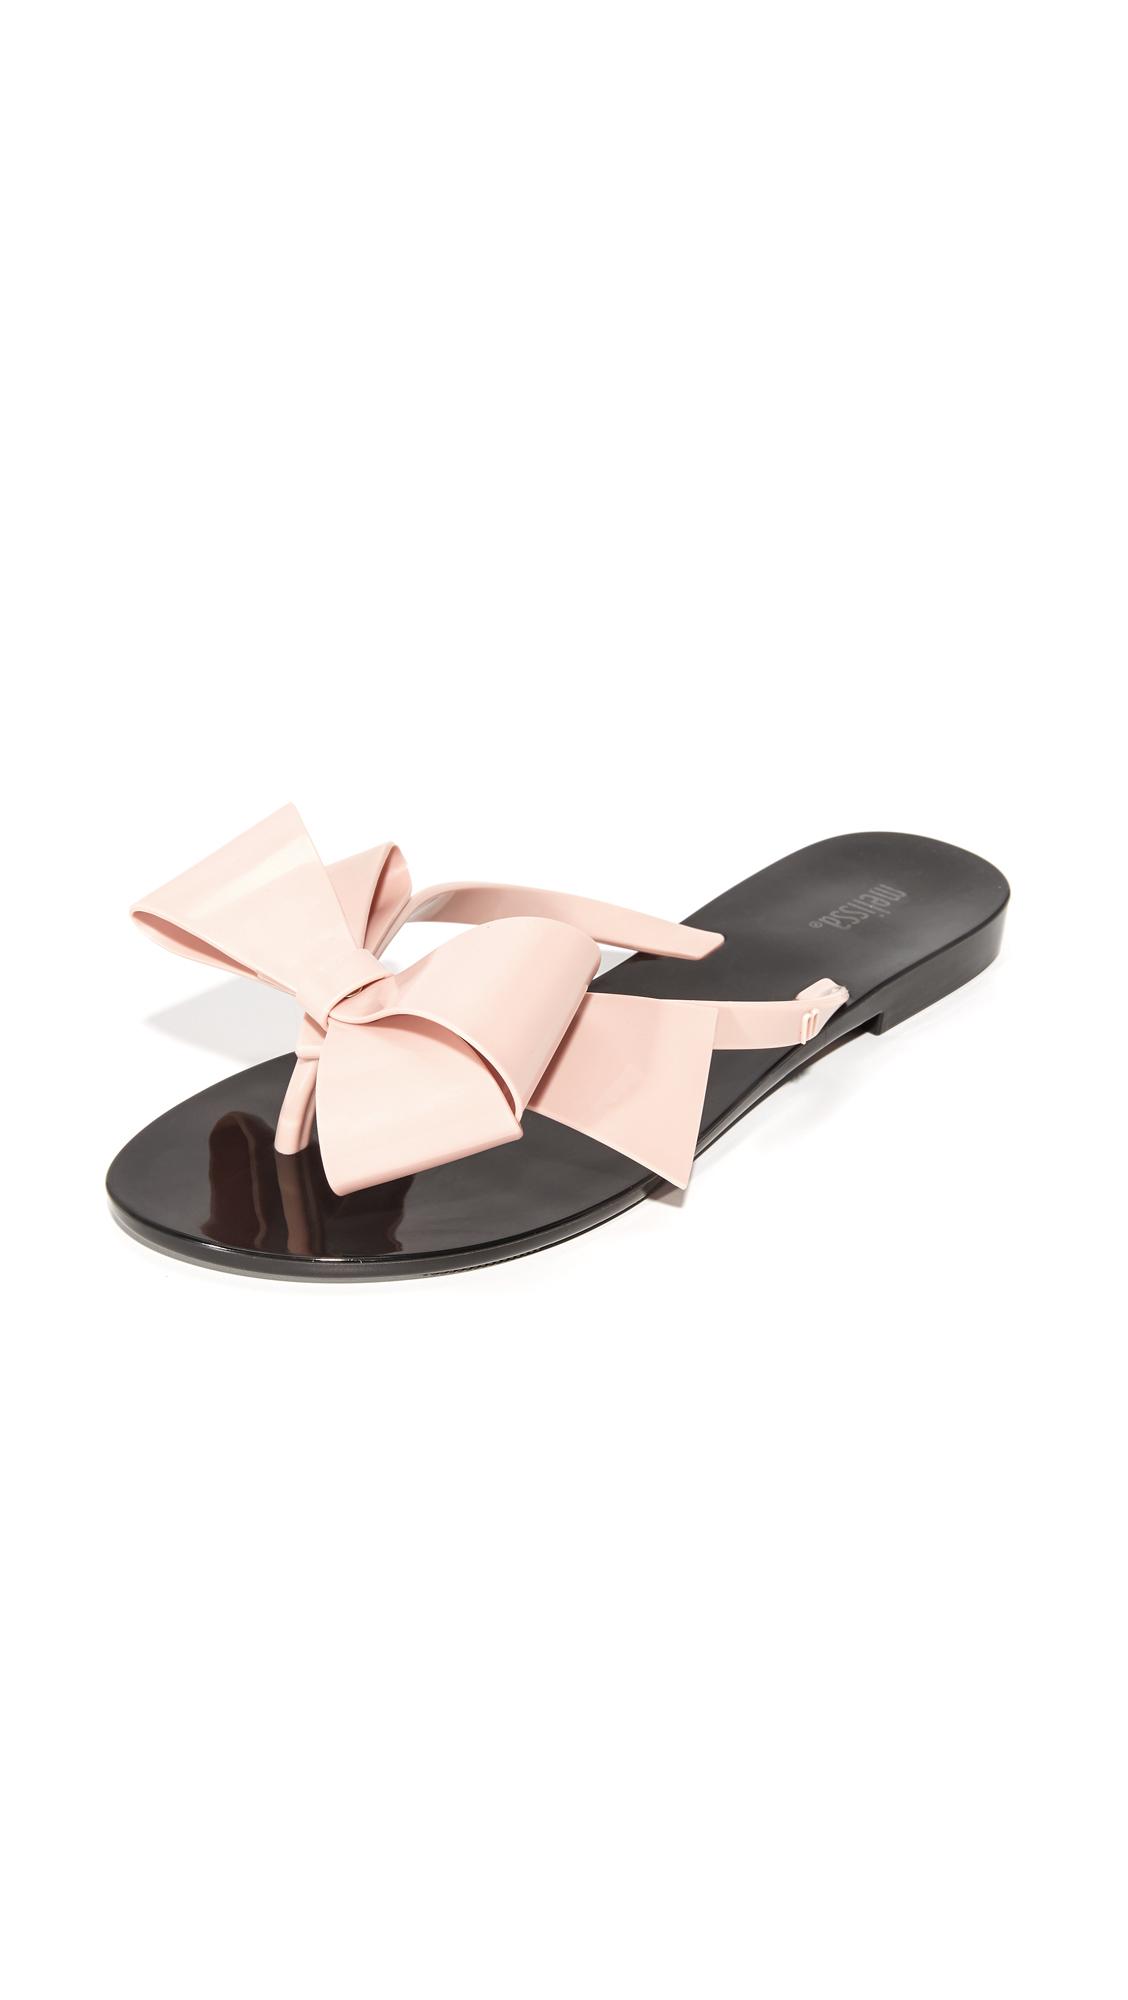 Melissa Harmonic Bow III Thong Sandals - Black/Pink